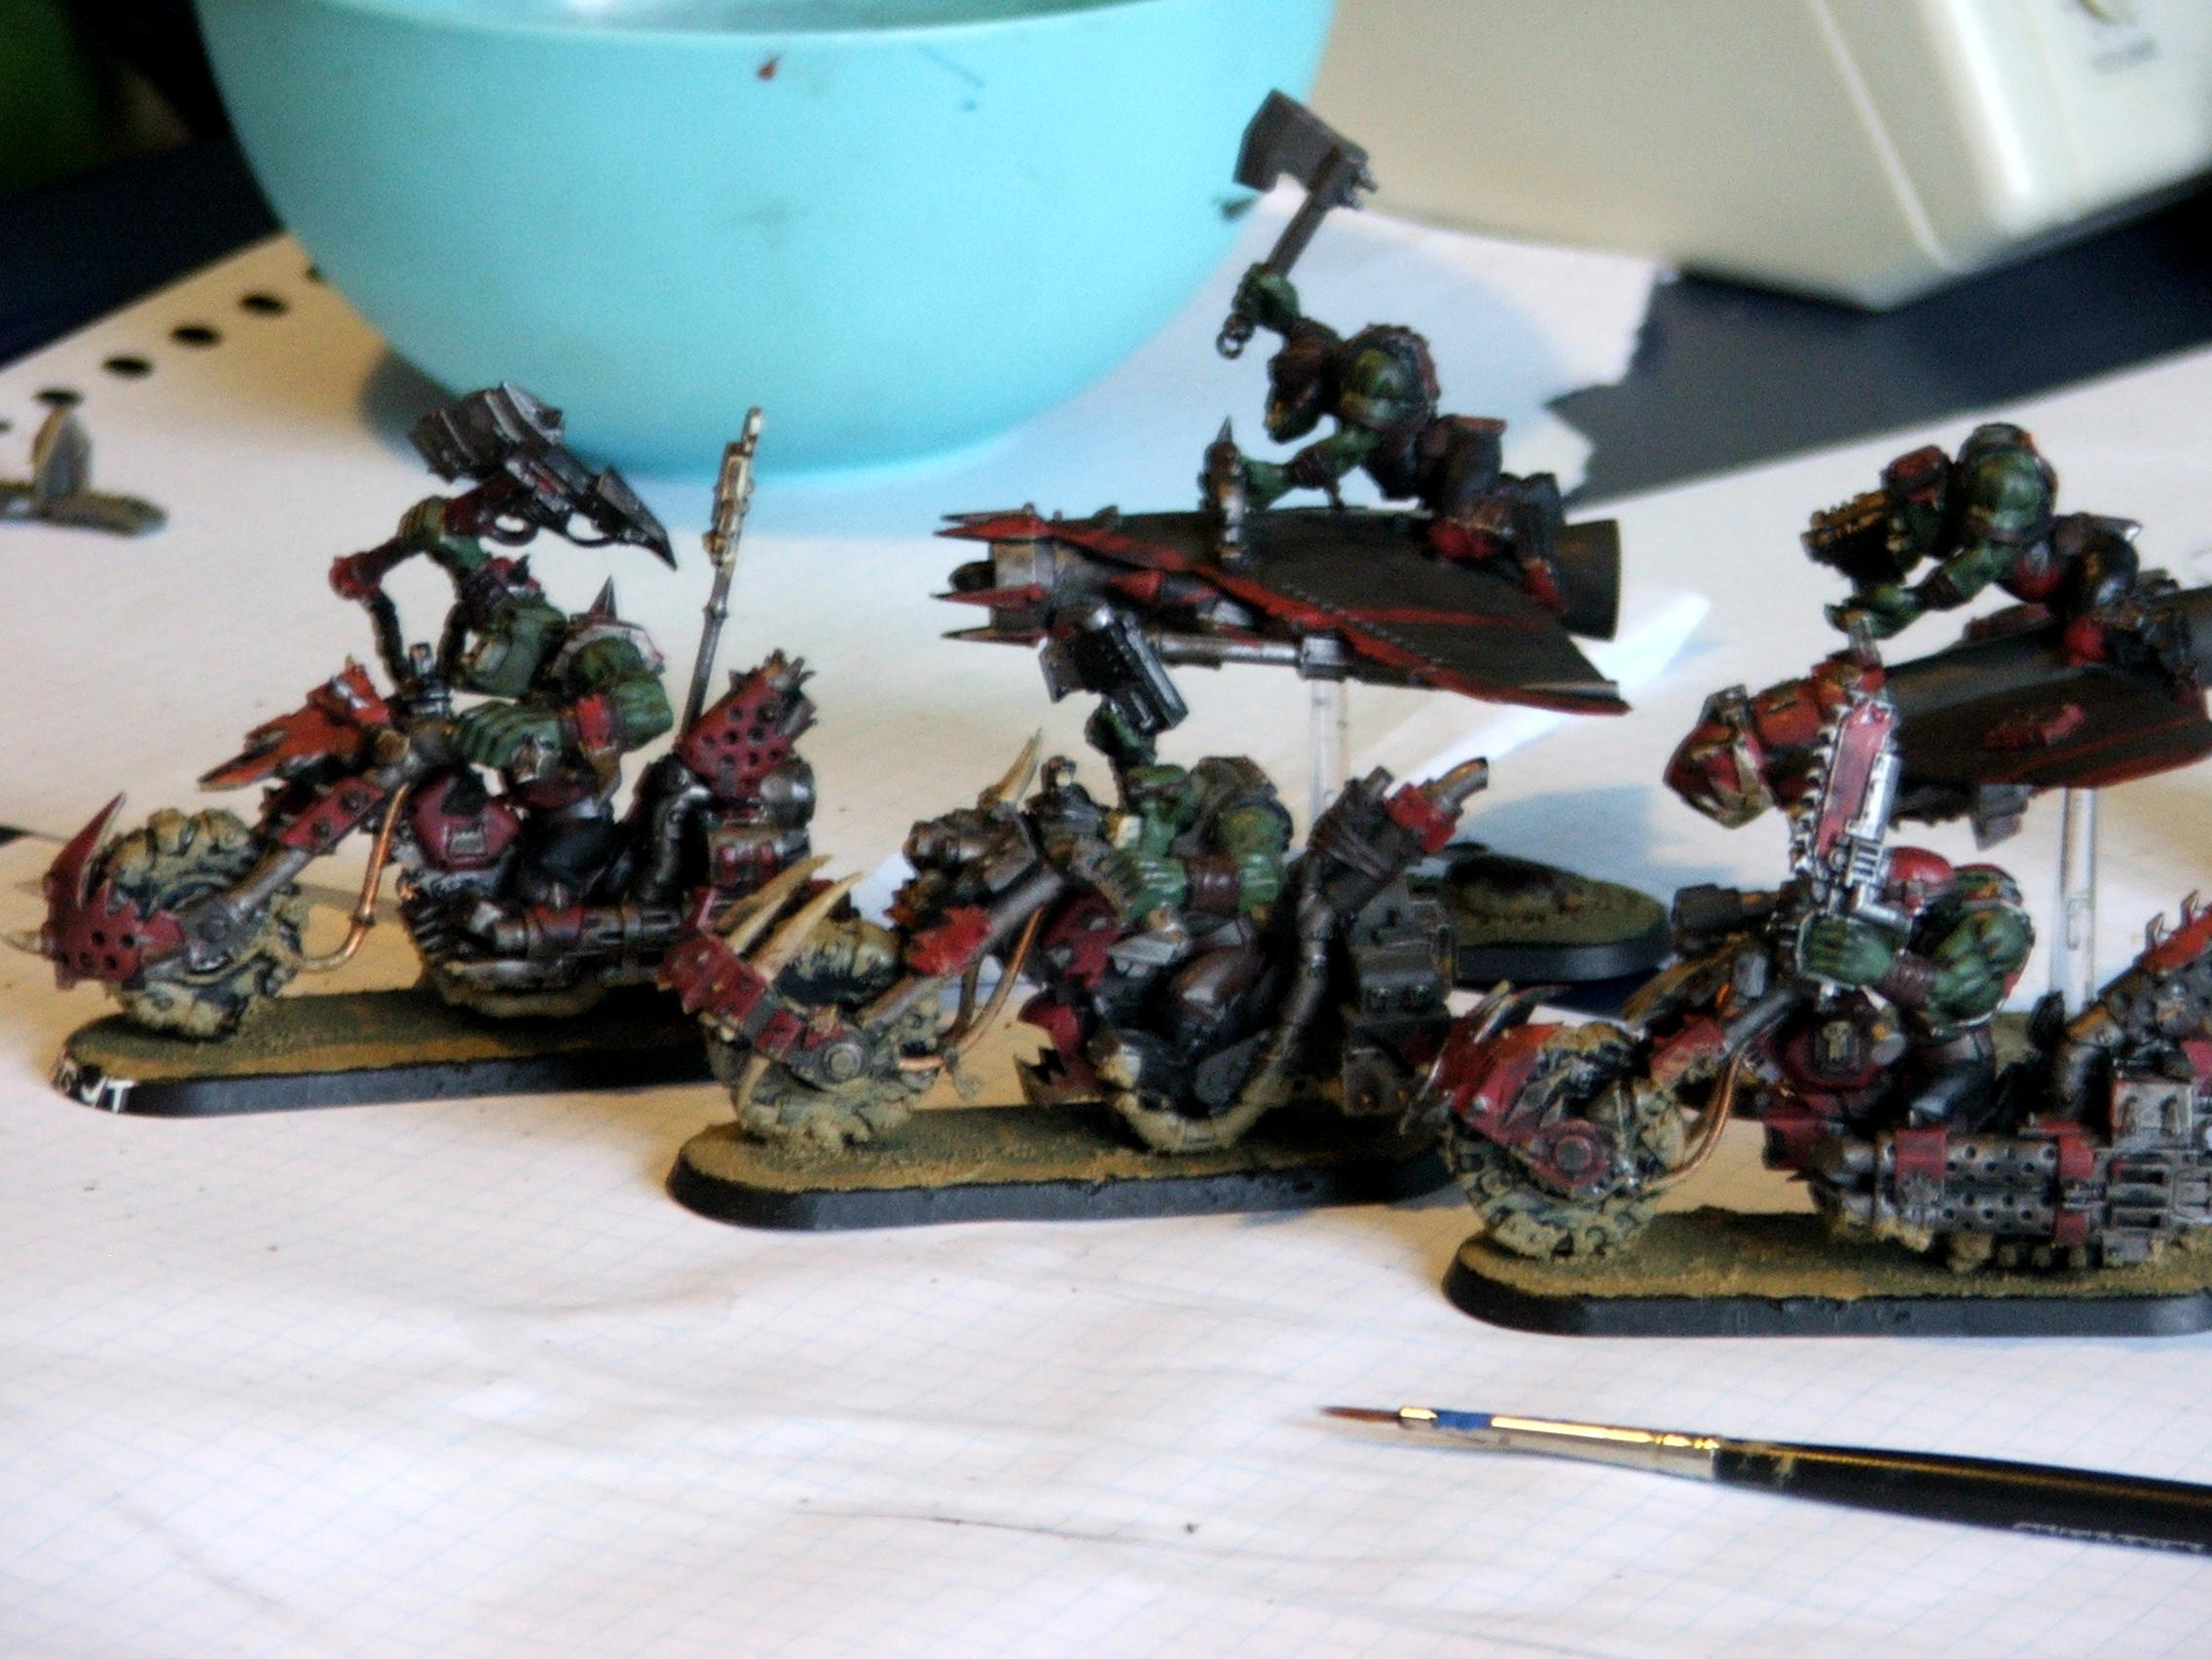 Ork Bikers, Ork Wip, Orks, Waaaghhh